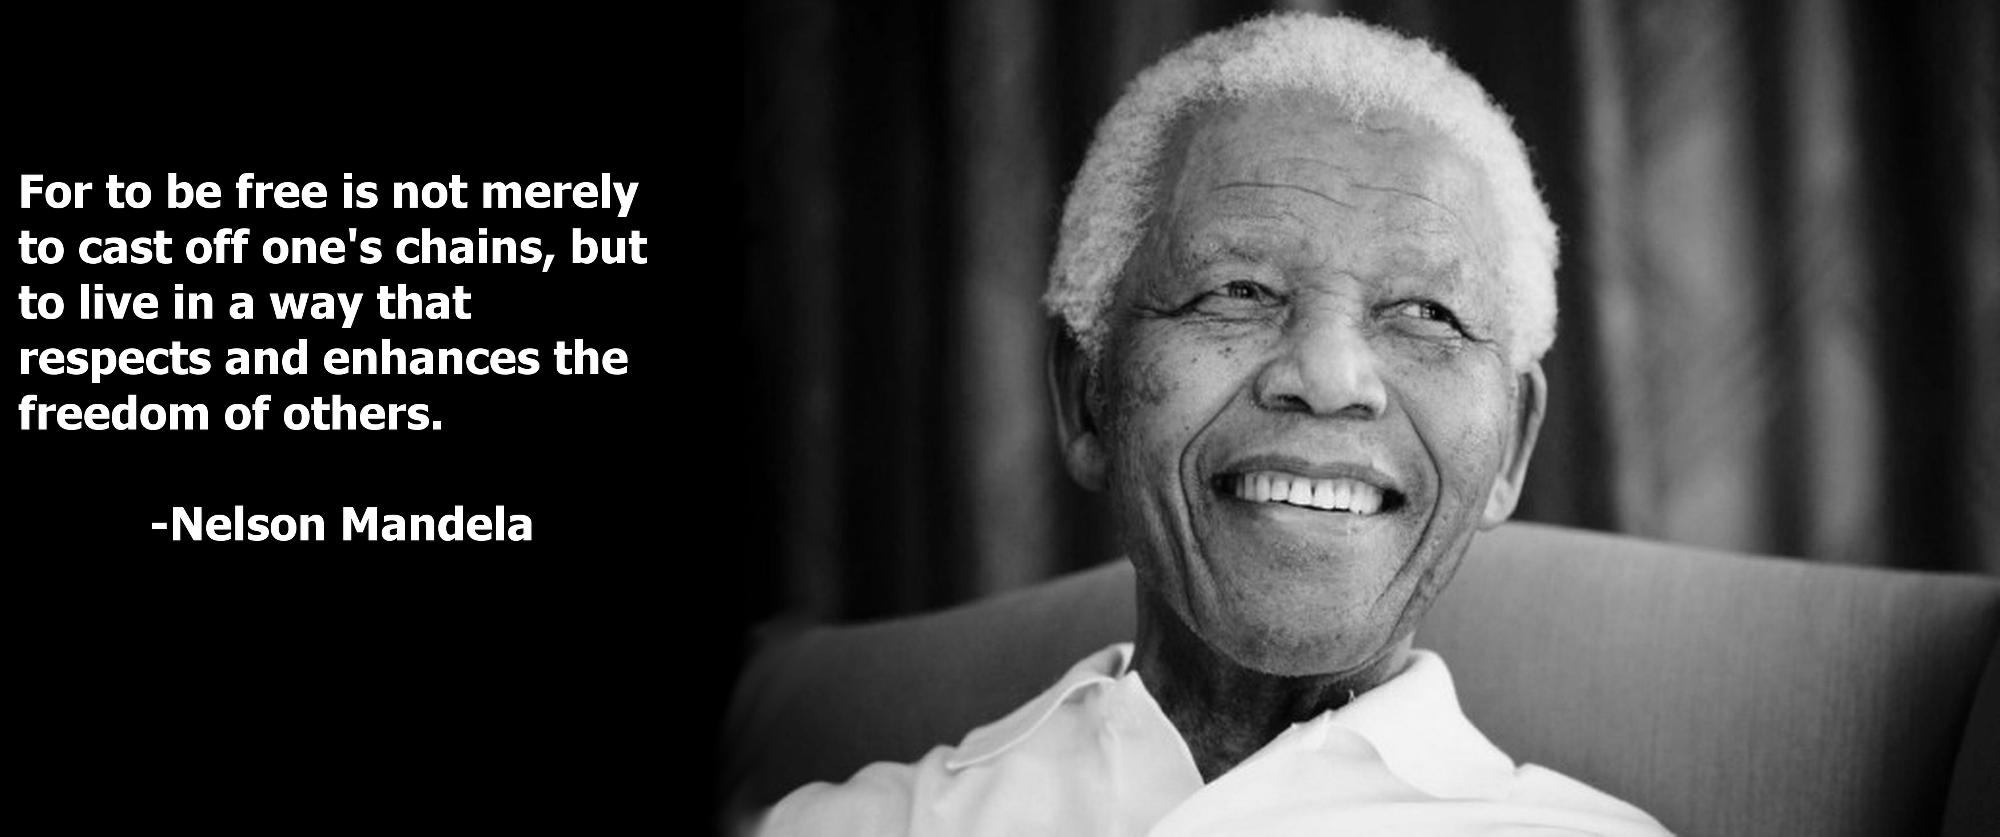 Nelson Mandela Quote Graphics And Servant Leadership Mandela Quotes Nelson Mandela Quotes Nelson Mandela Education Quote